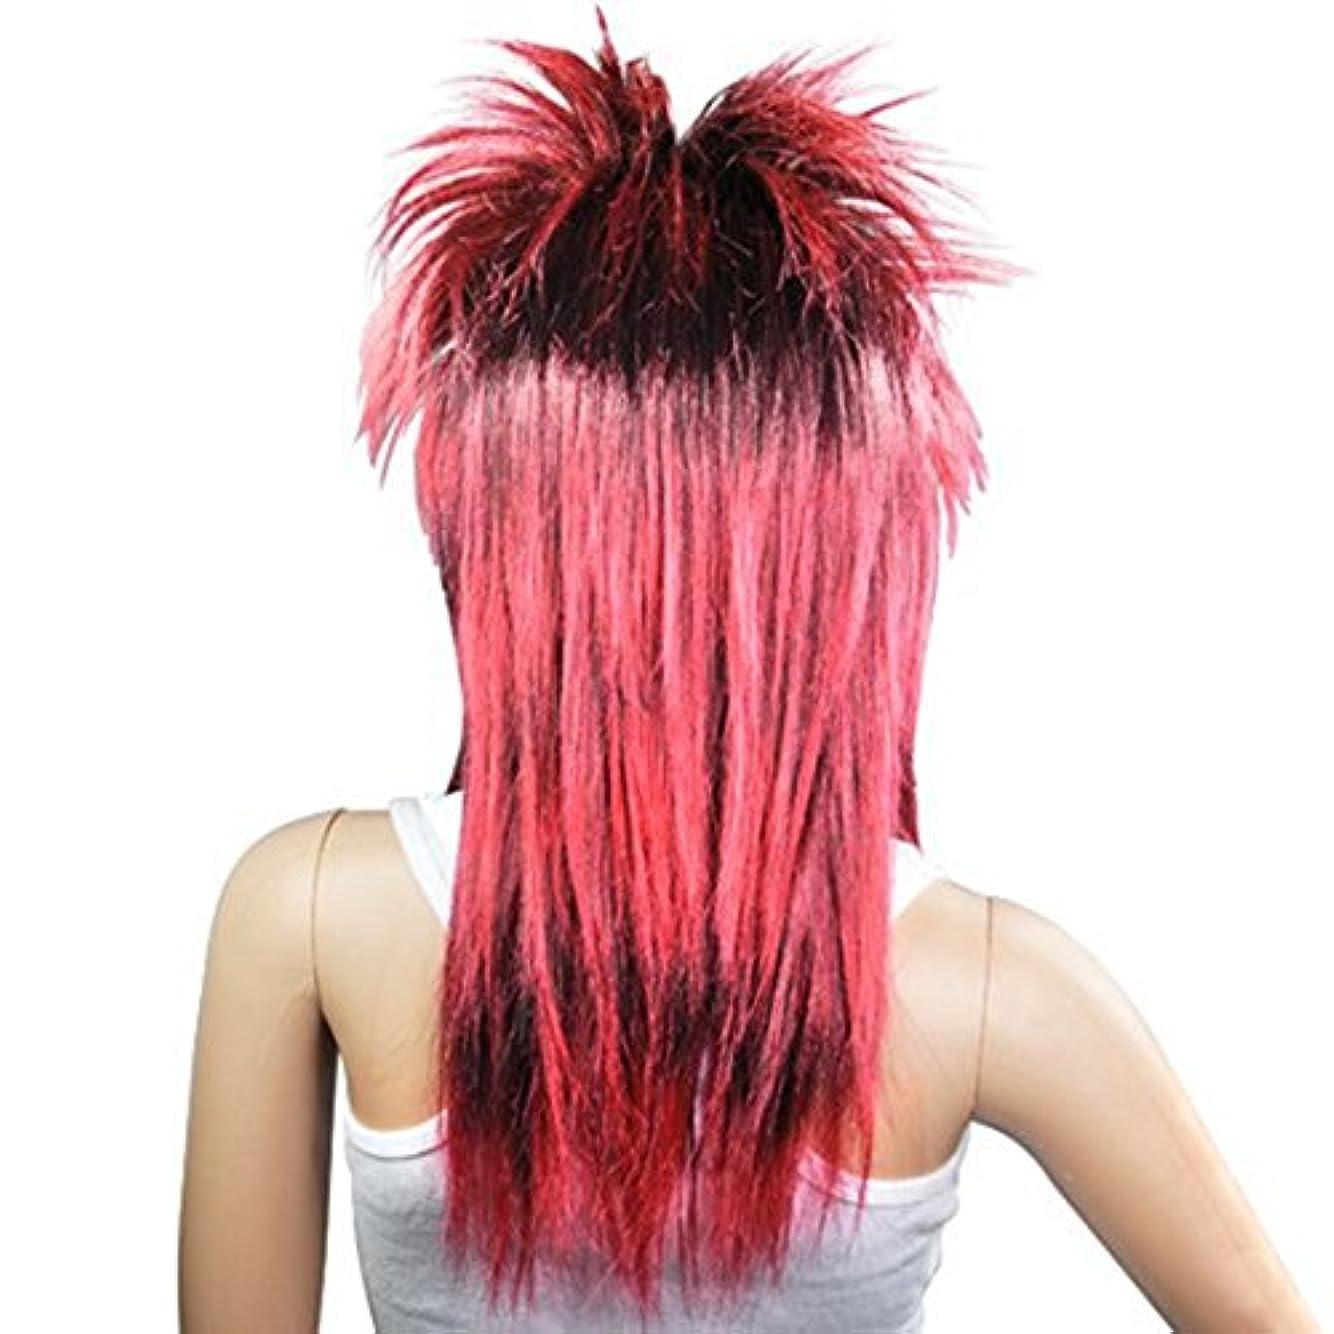 Cikuso 赤黒 女性の魅力的なパンクロッカーチックティナ?ターナーカーニバルかつら仮装コスチューム